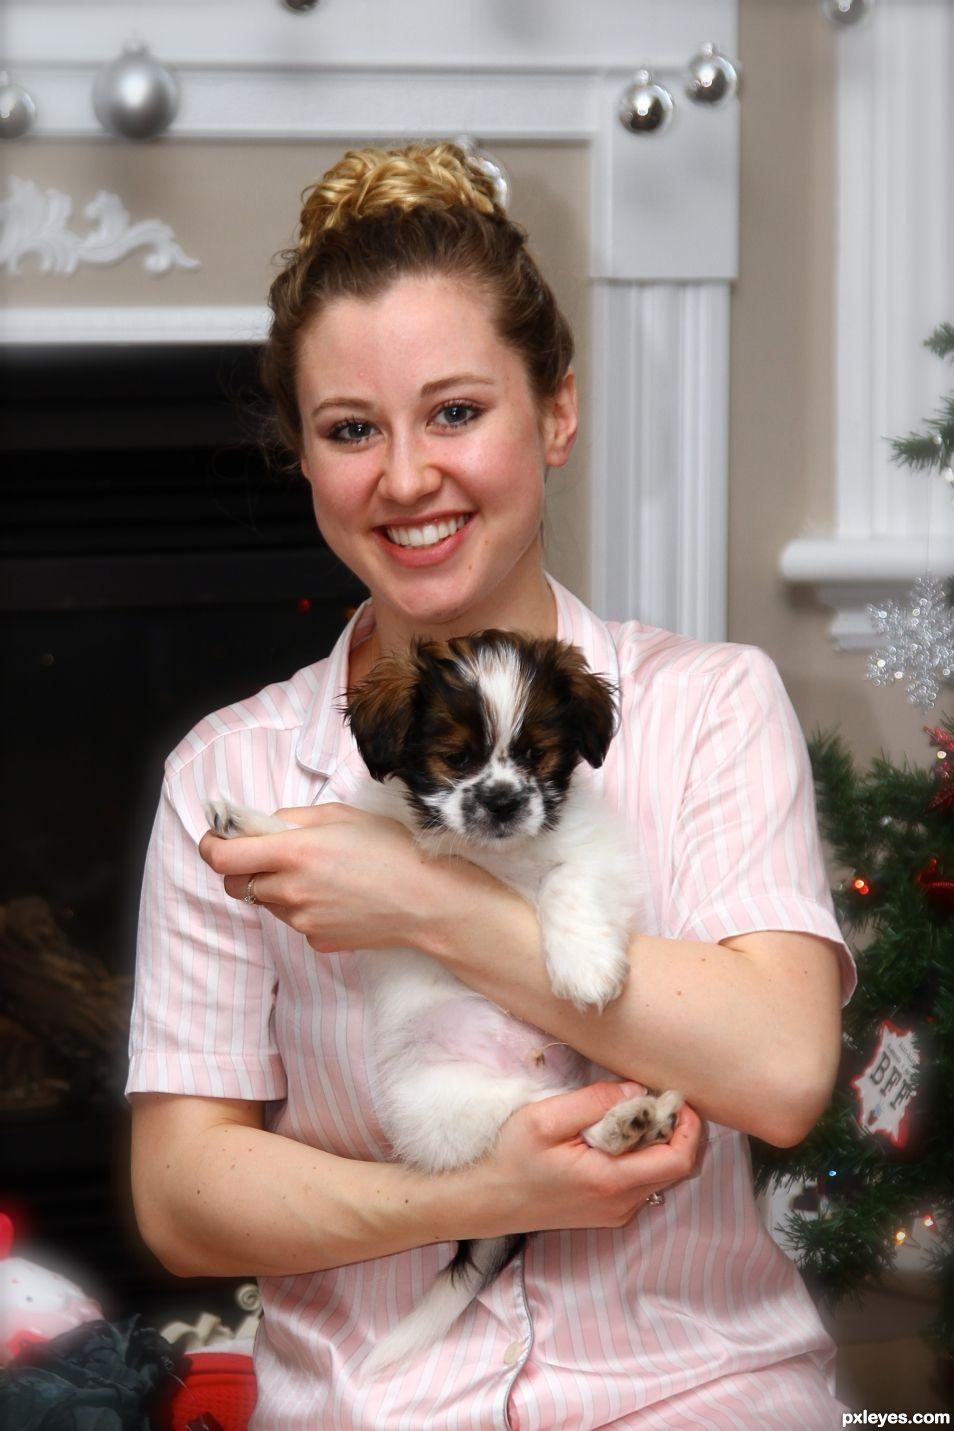 Puppies make Everyone Happy